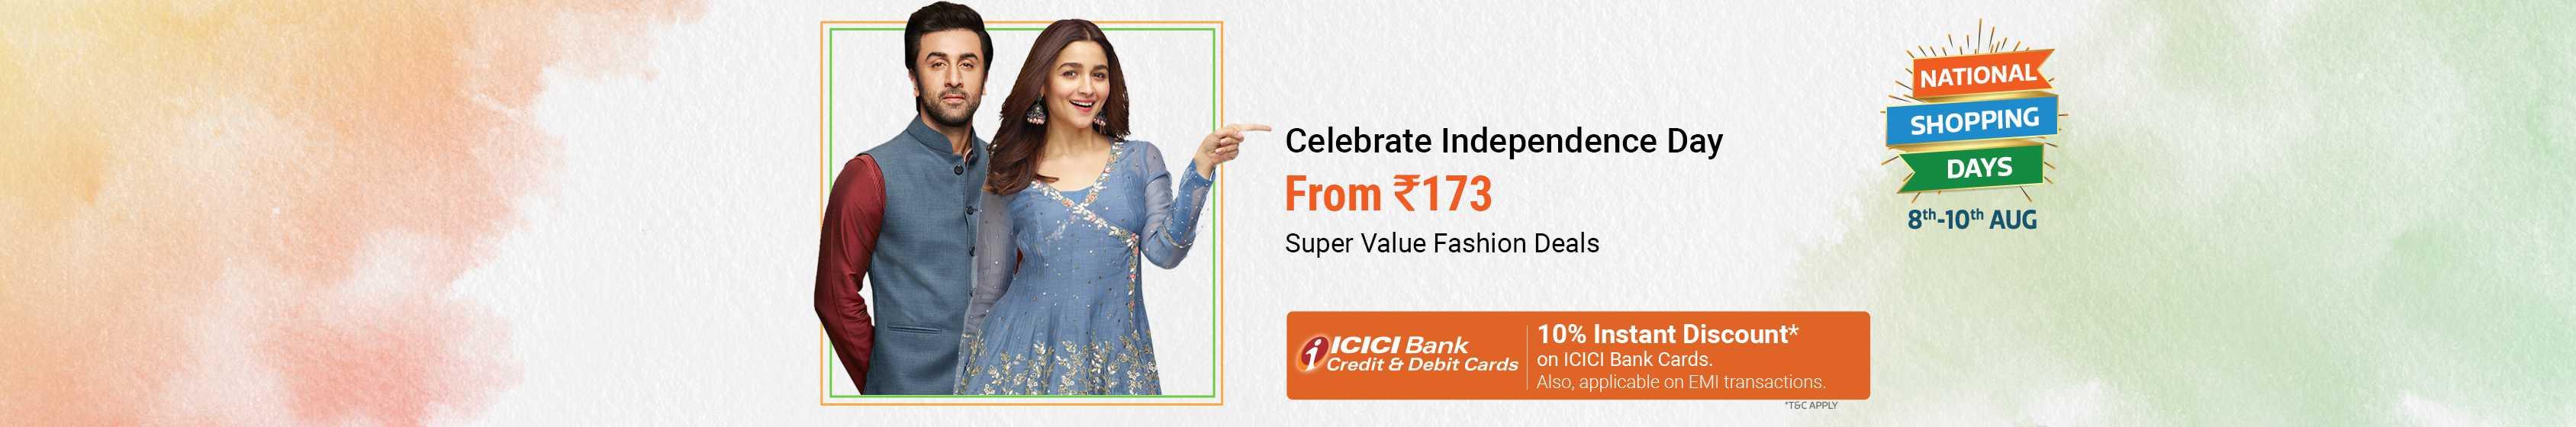 Online Shopping India Mobile,Cameras,Lifestyle & more Online @ Flipkart.com